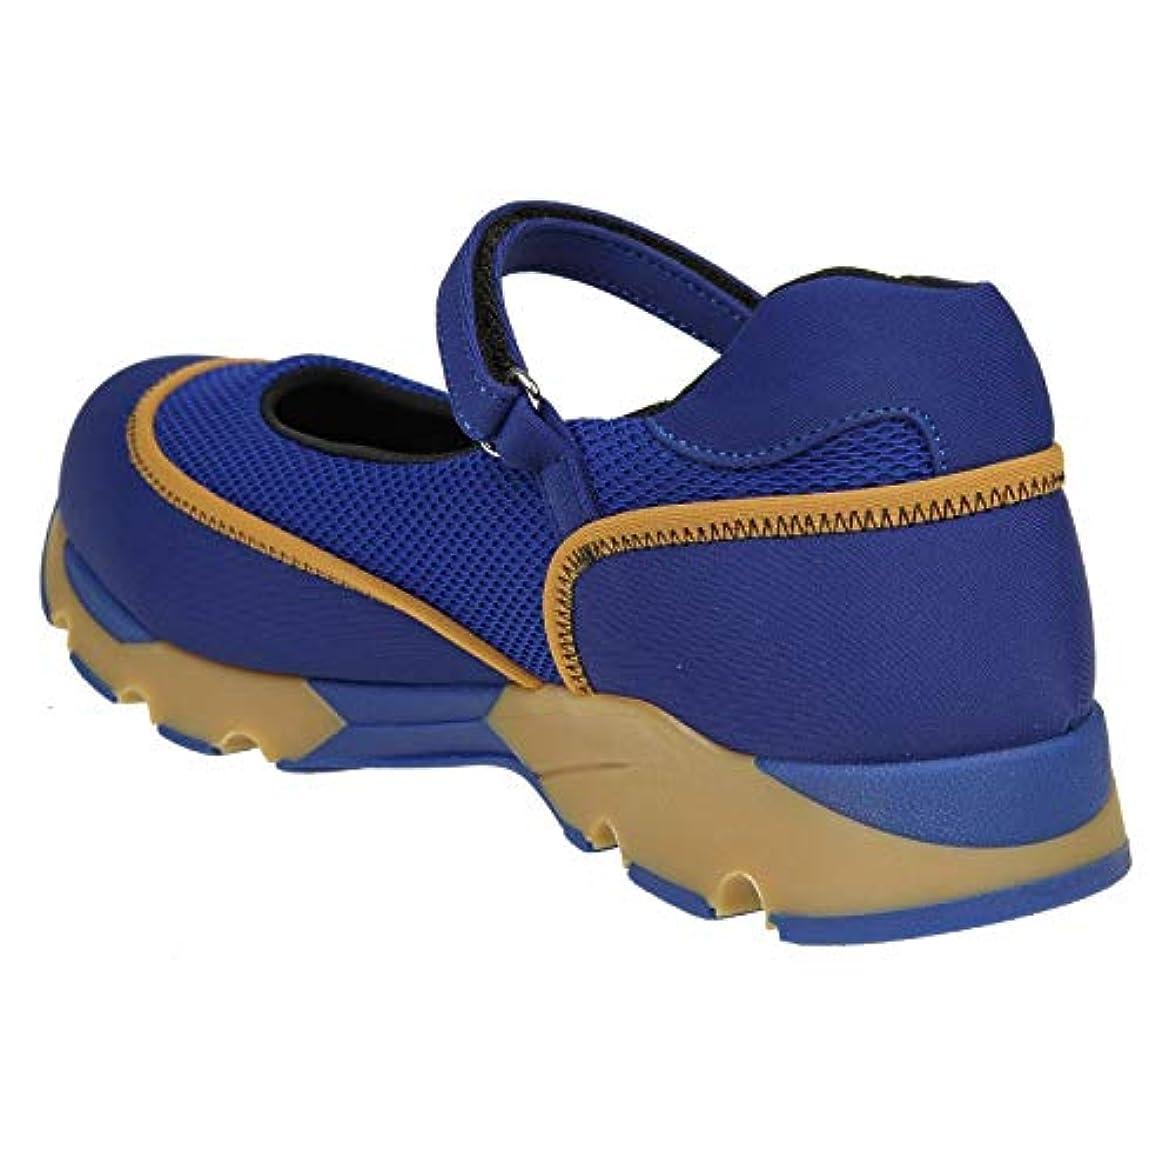 Marni Sneakers Donna Snzw000103tcr8600b59 Poliestere Blu